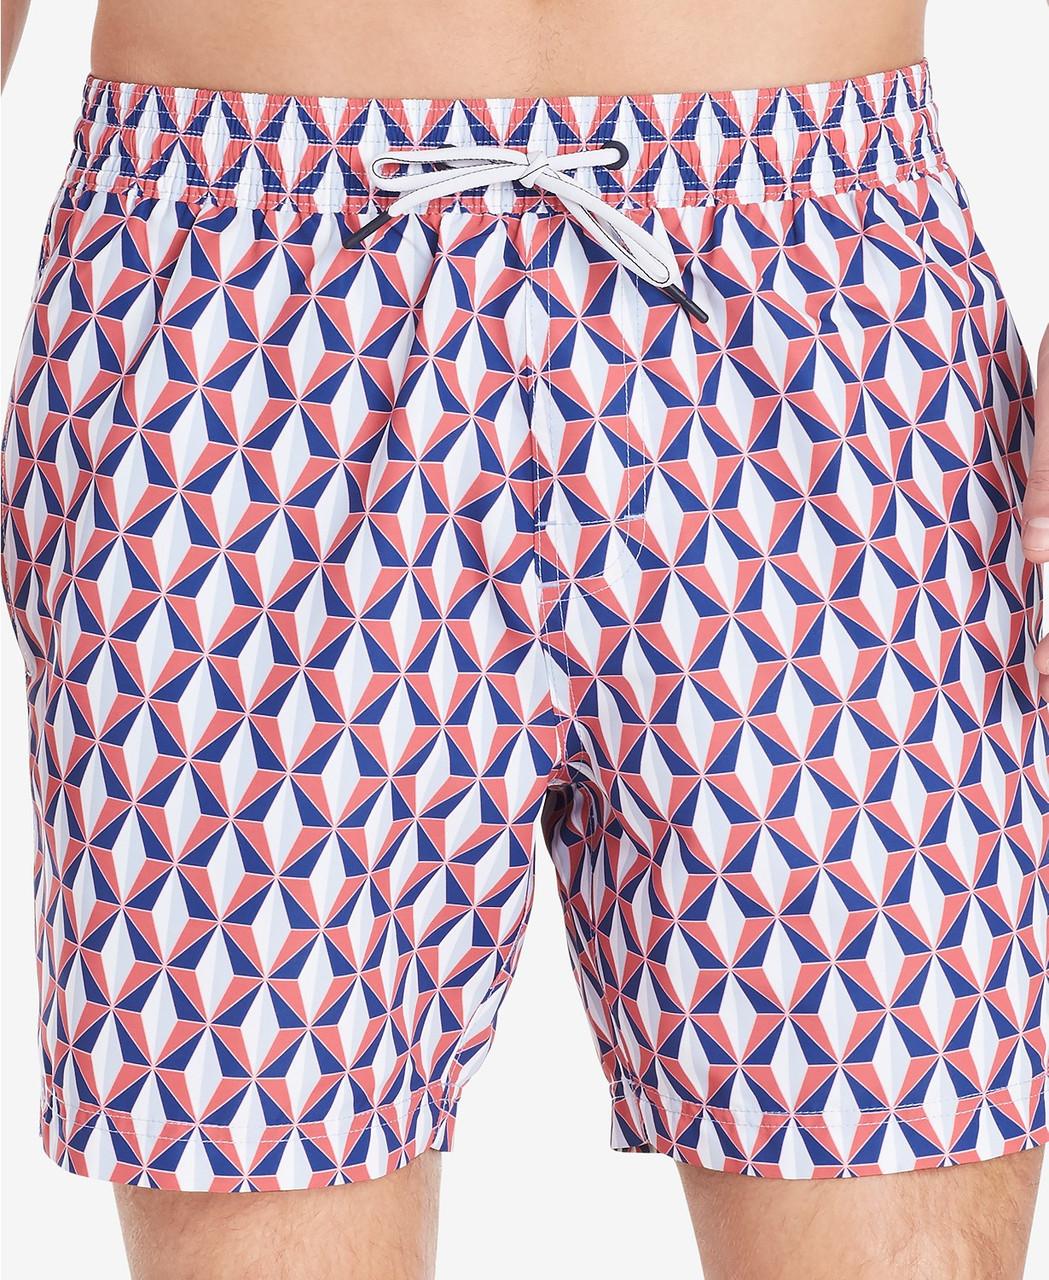 Tommy Hilfiger мужские плавательные шорты - Е2